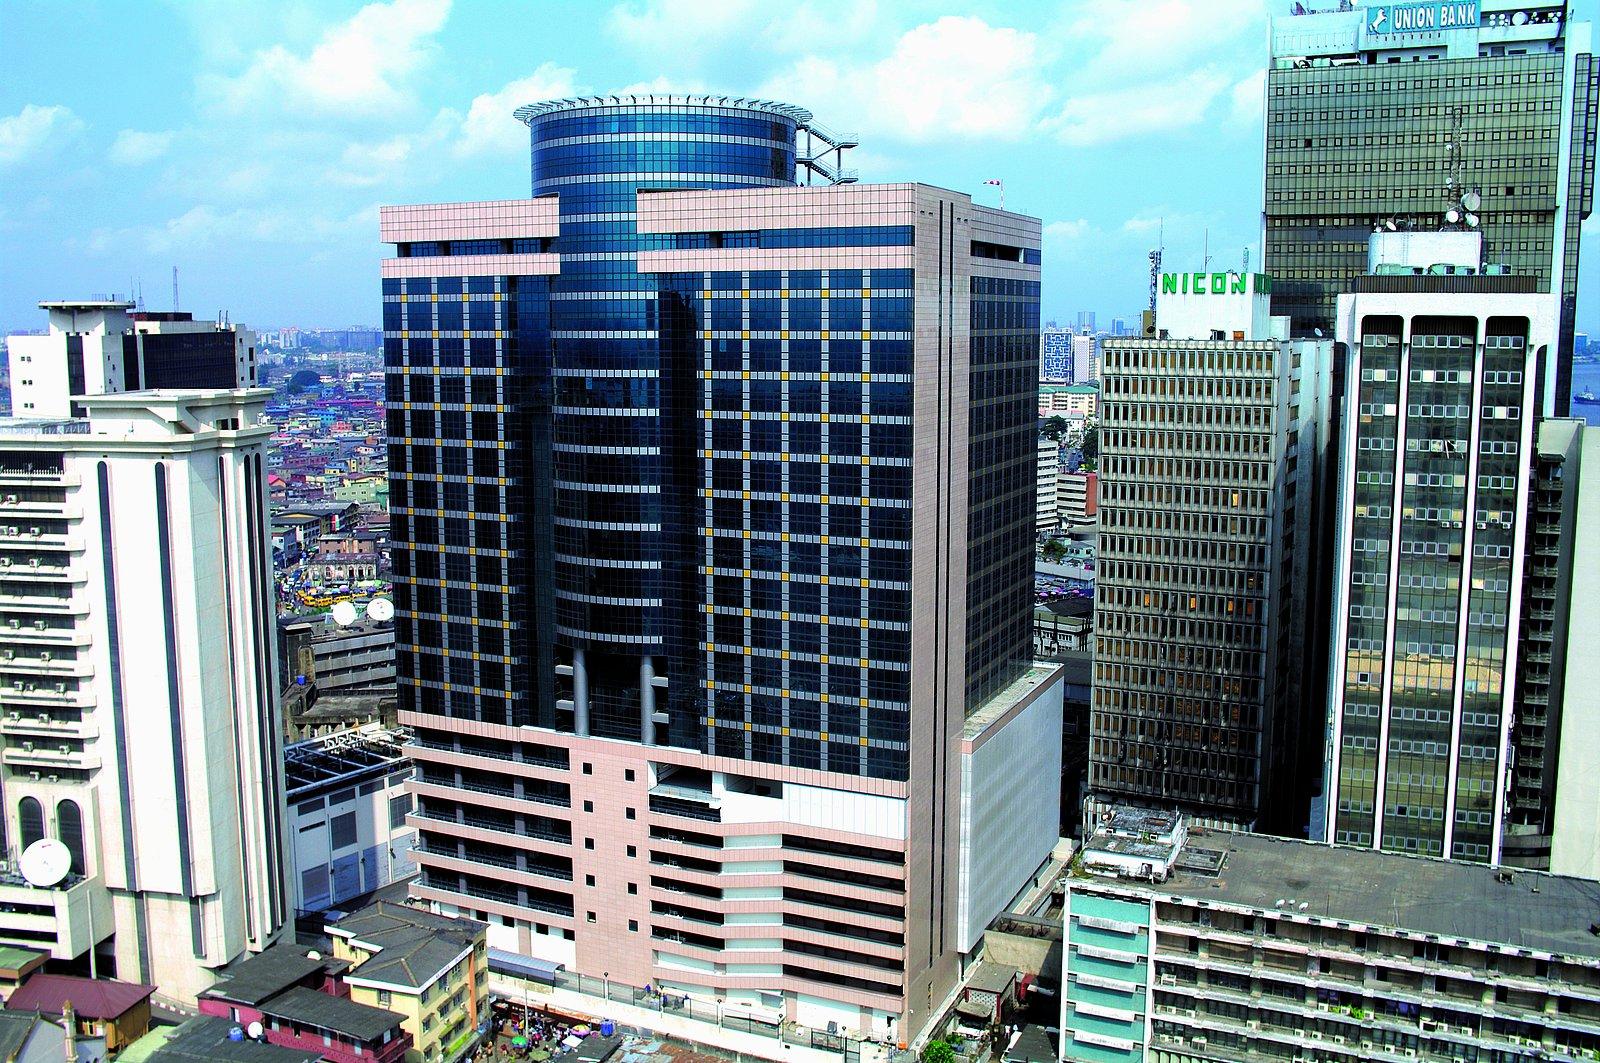 Central Bank of Nigeria, Lagos Office - Julius Berger Nigeria Plc - Julius  Berger Nigeria